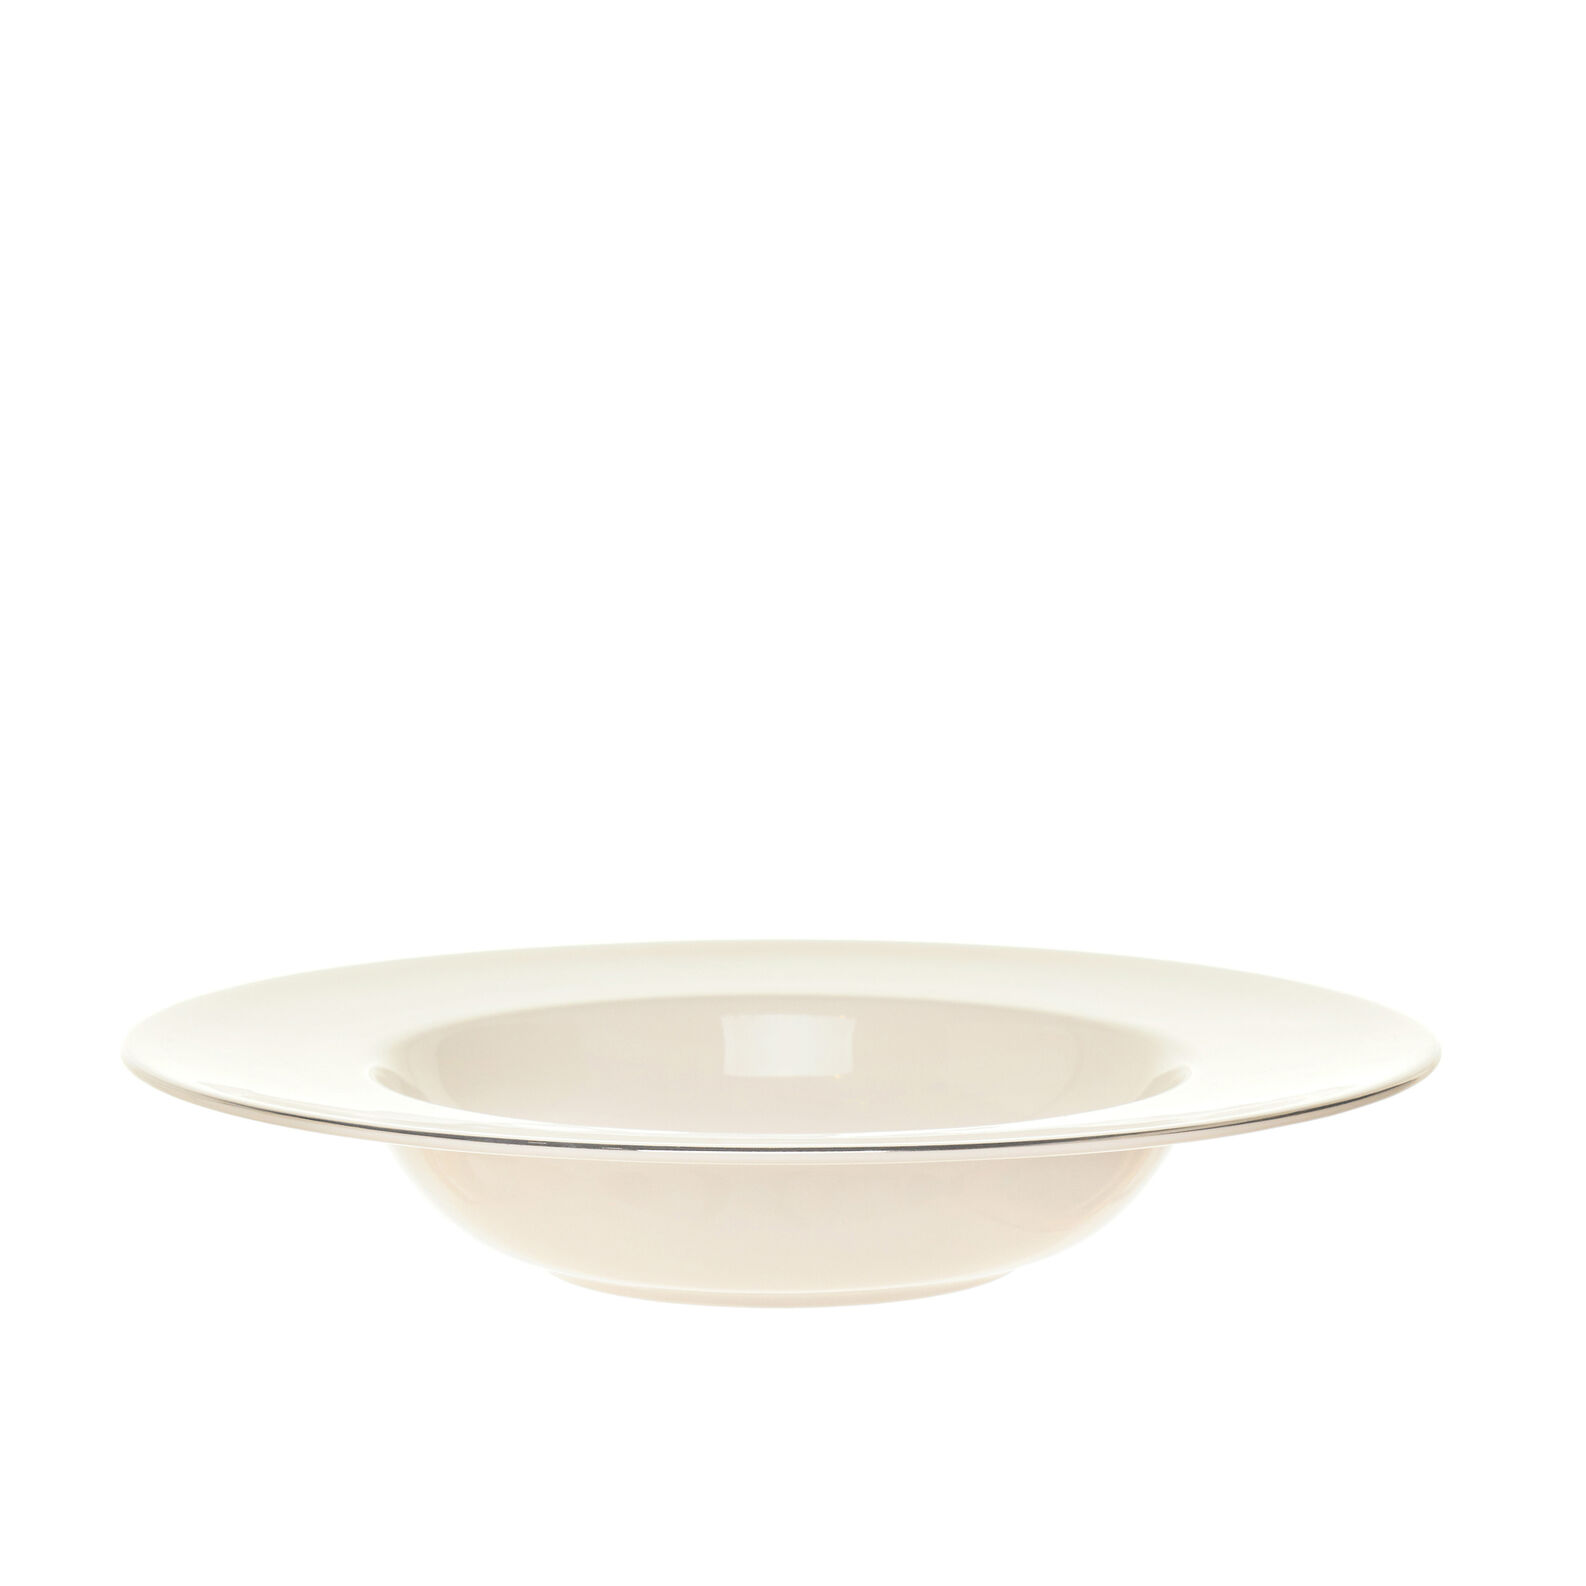 Rome new bone china bowl